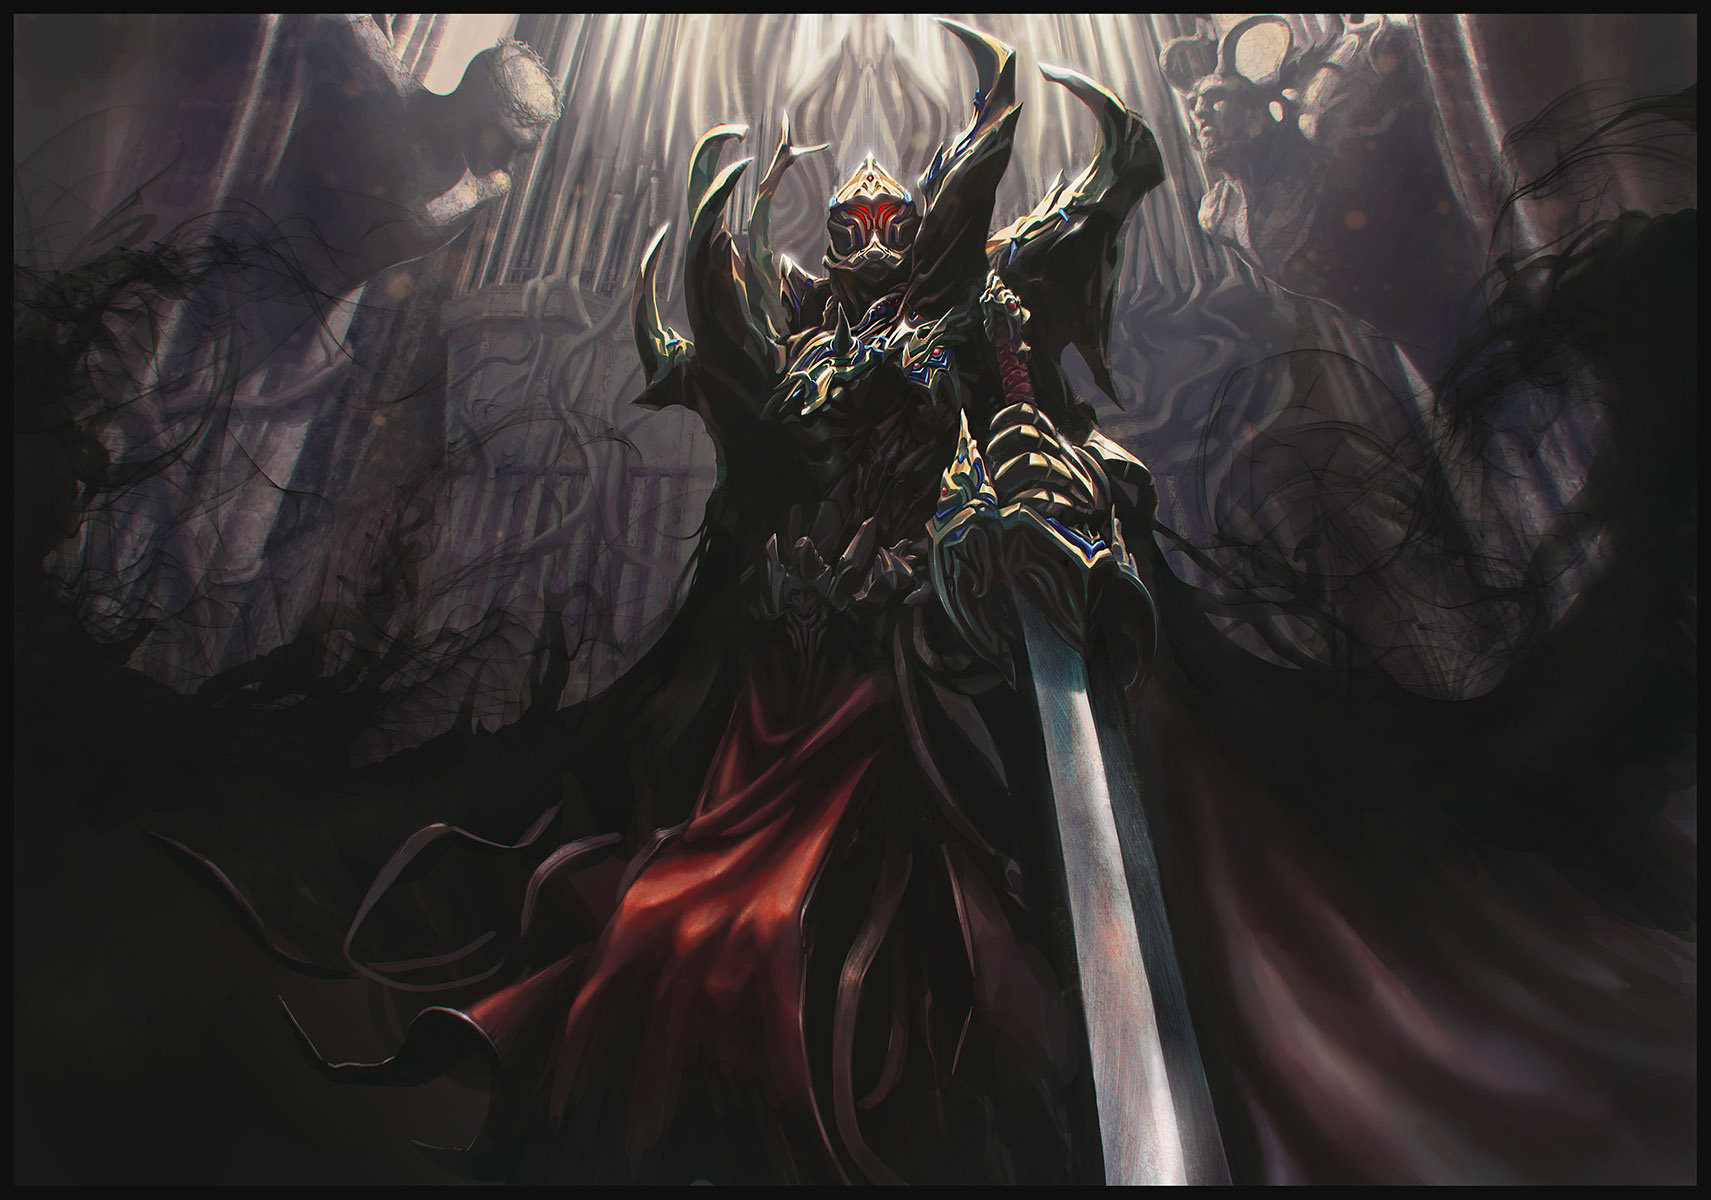 Anime Dark Angel Wallpaper Hui Zou Art Chaos Knight